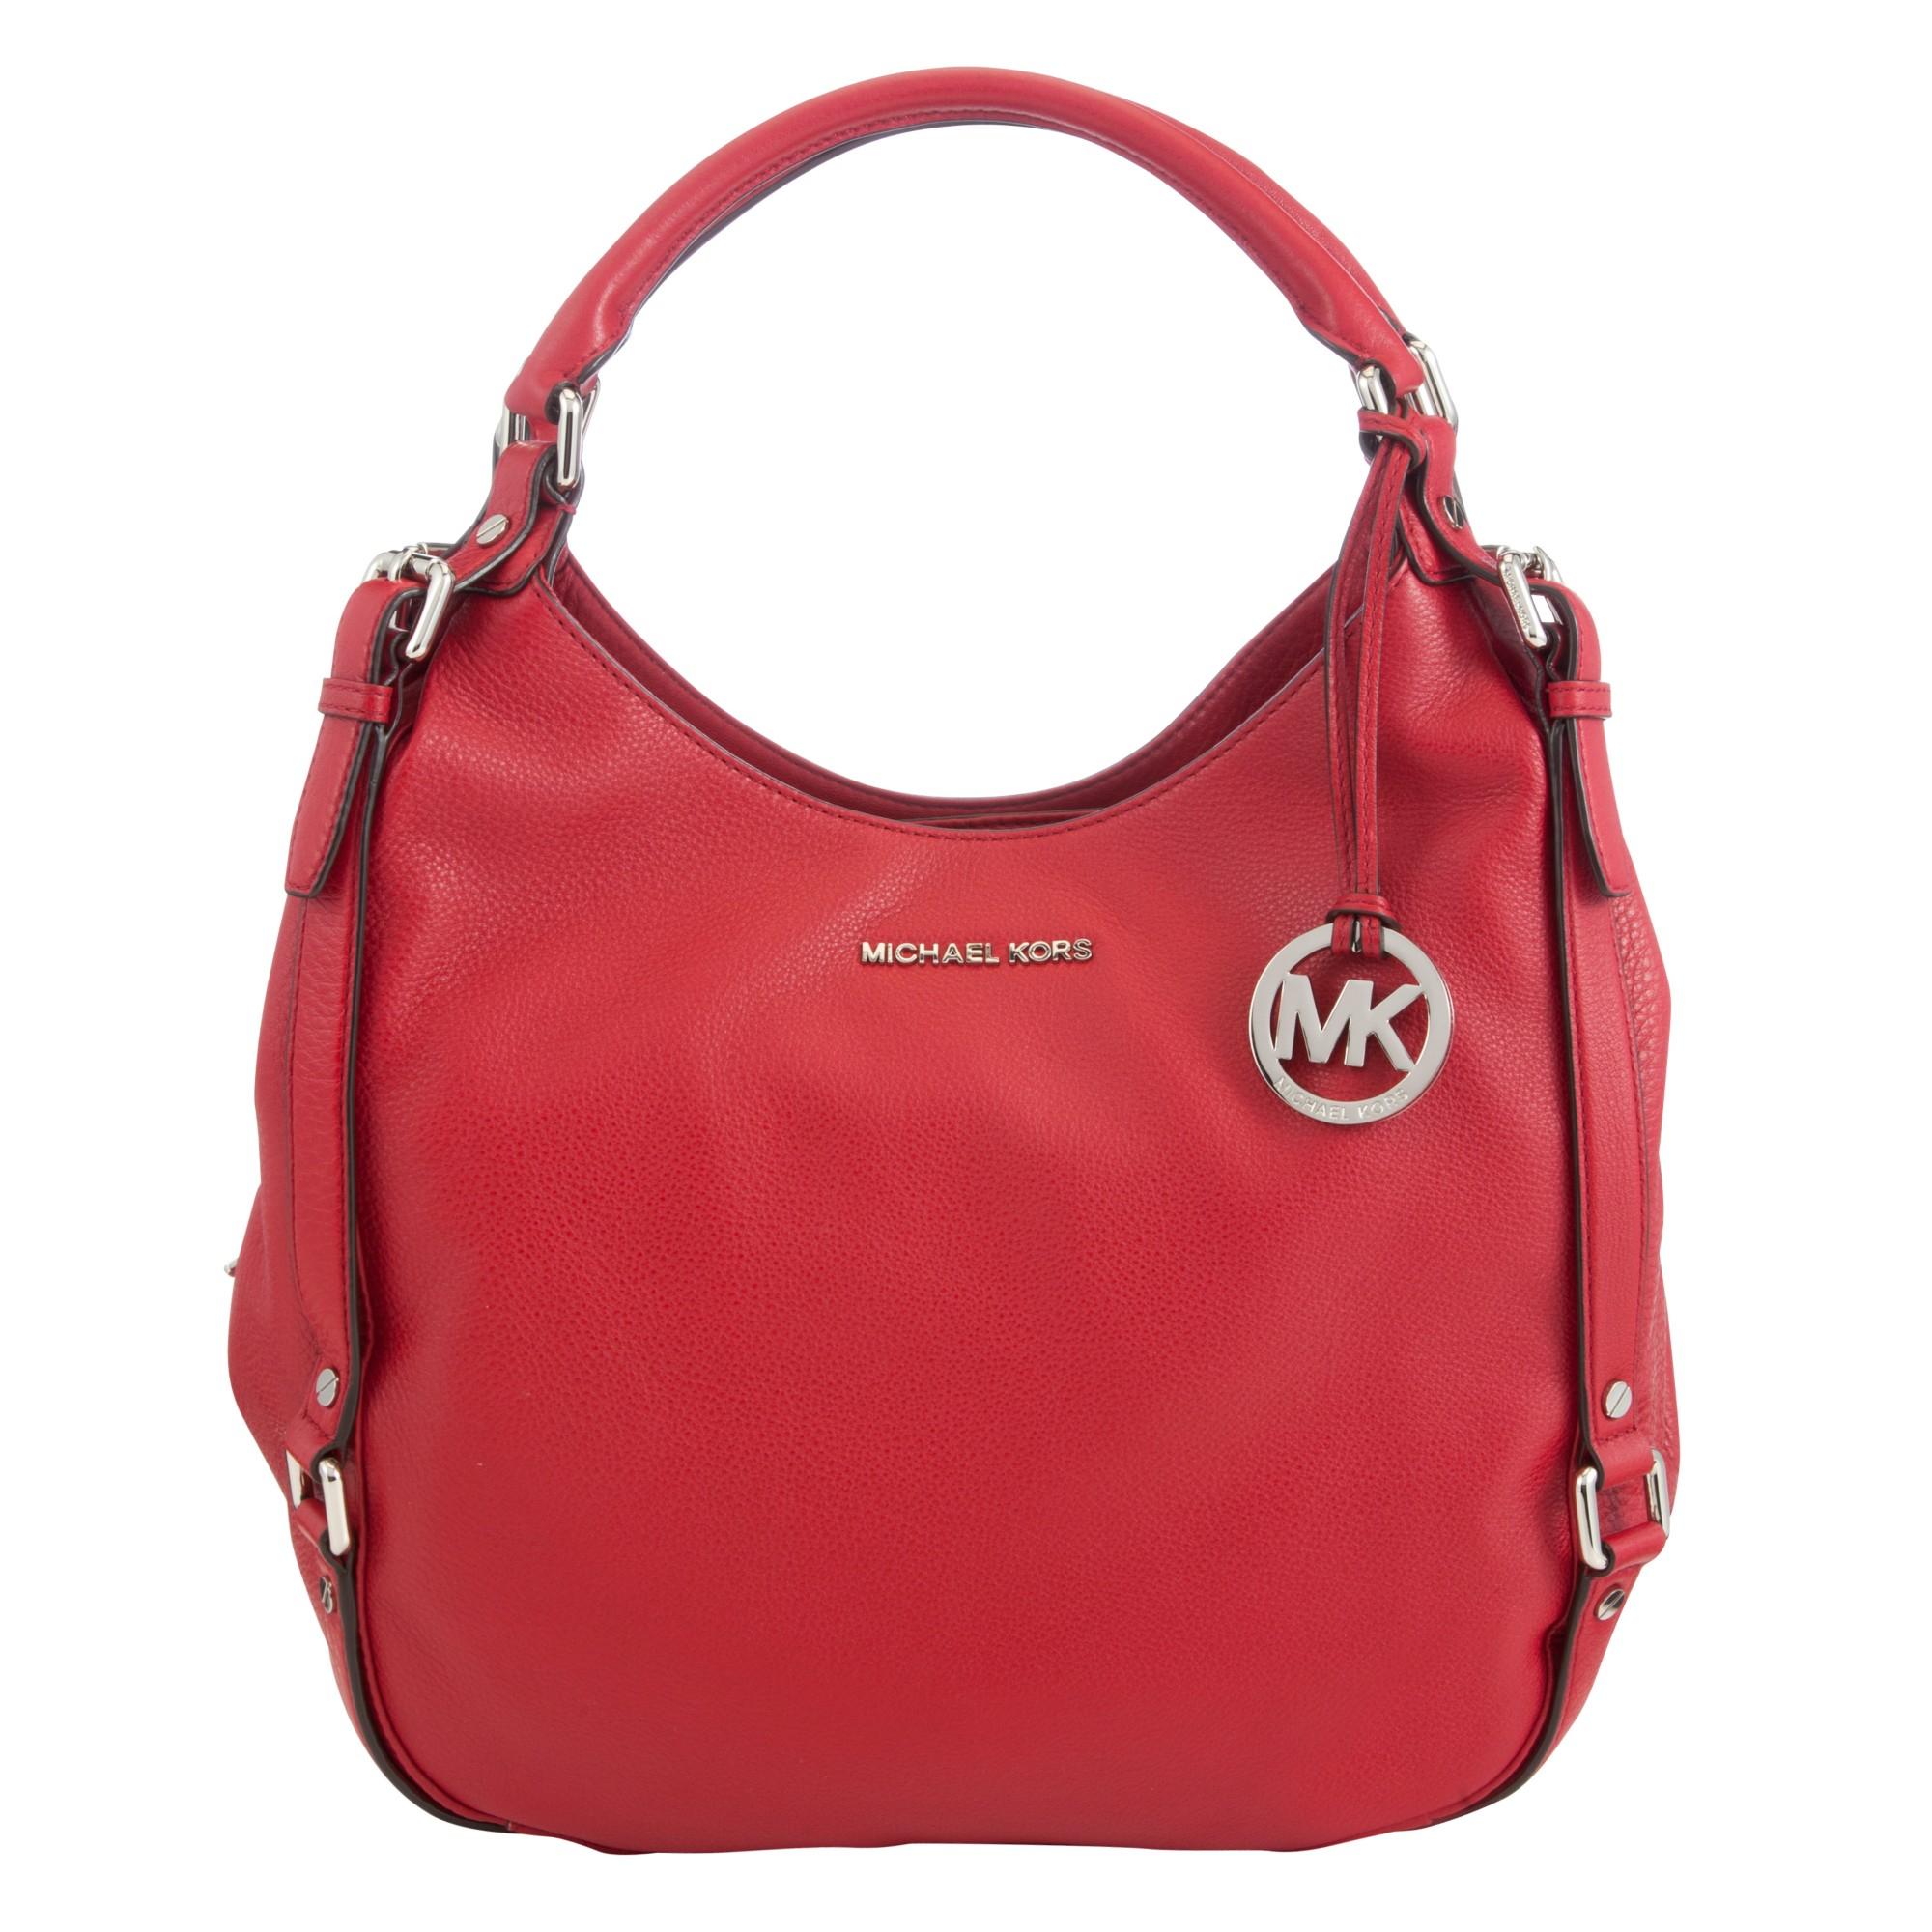 59b899075218bf Michael Kors Bedford Large Leather Shoulder Tote Bag in Red - Lyst